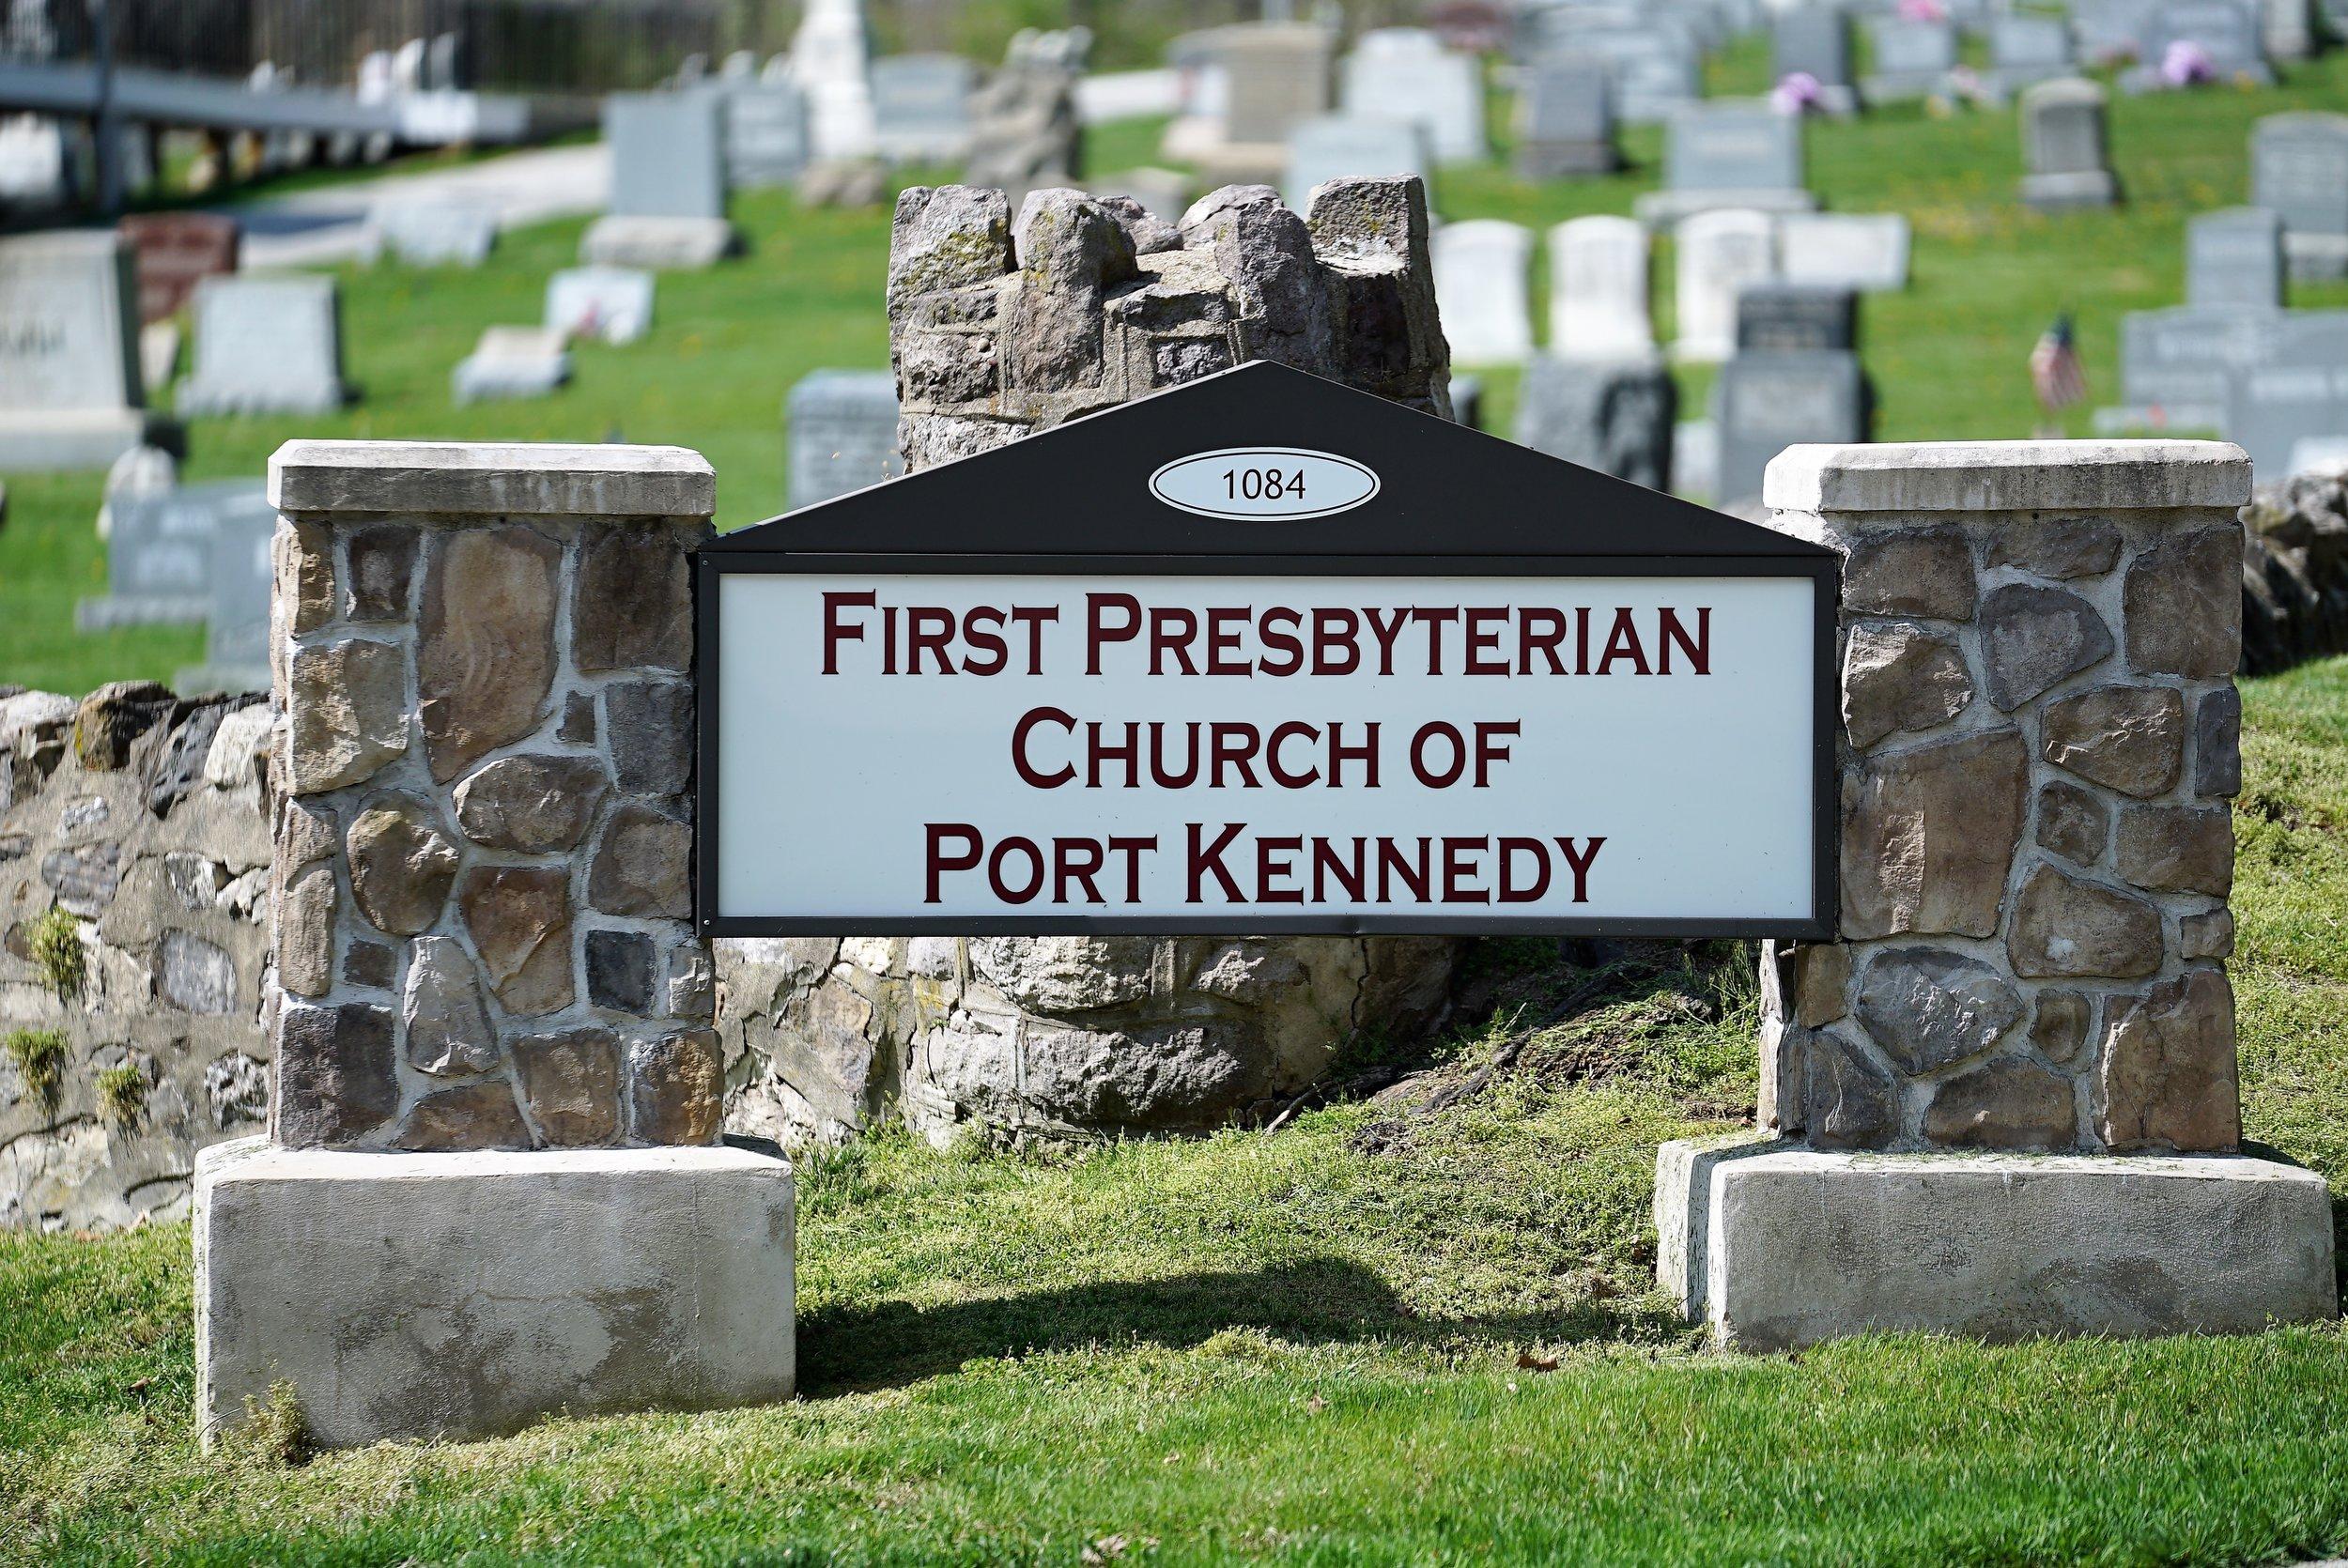 First Presbyterian Church Of Port Kennedy. King Of Prussia, Pennsylvania.